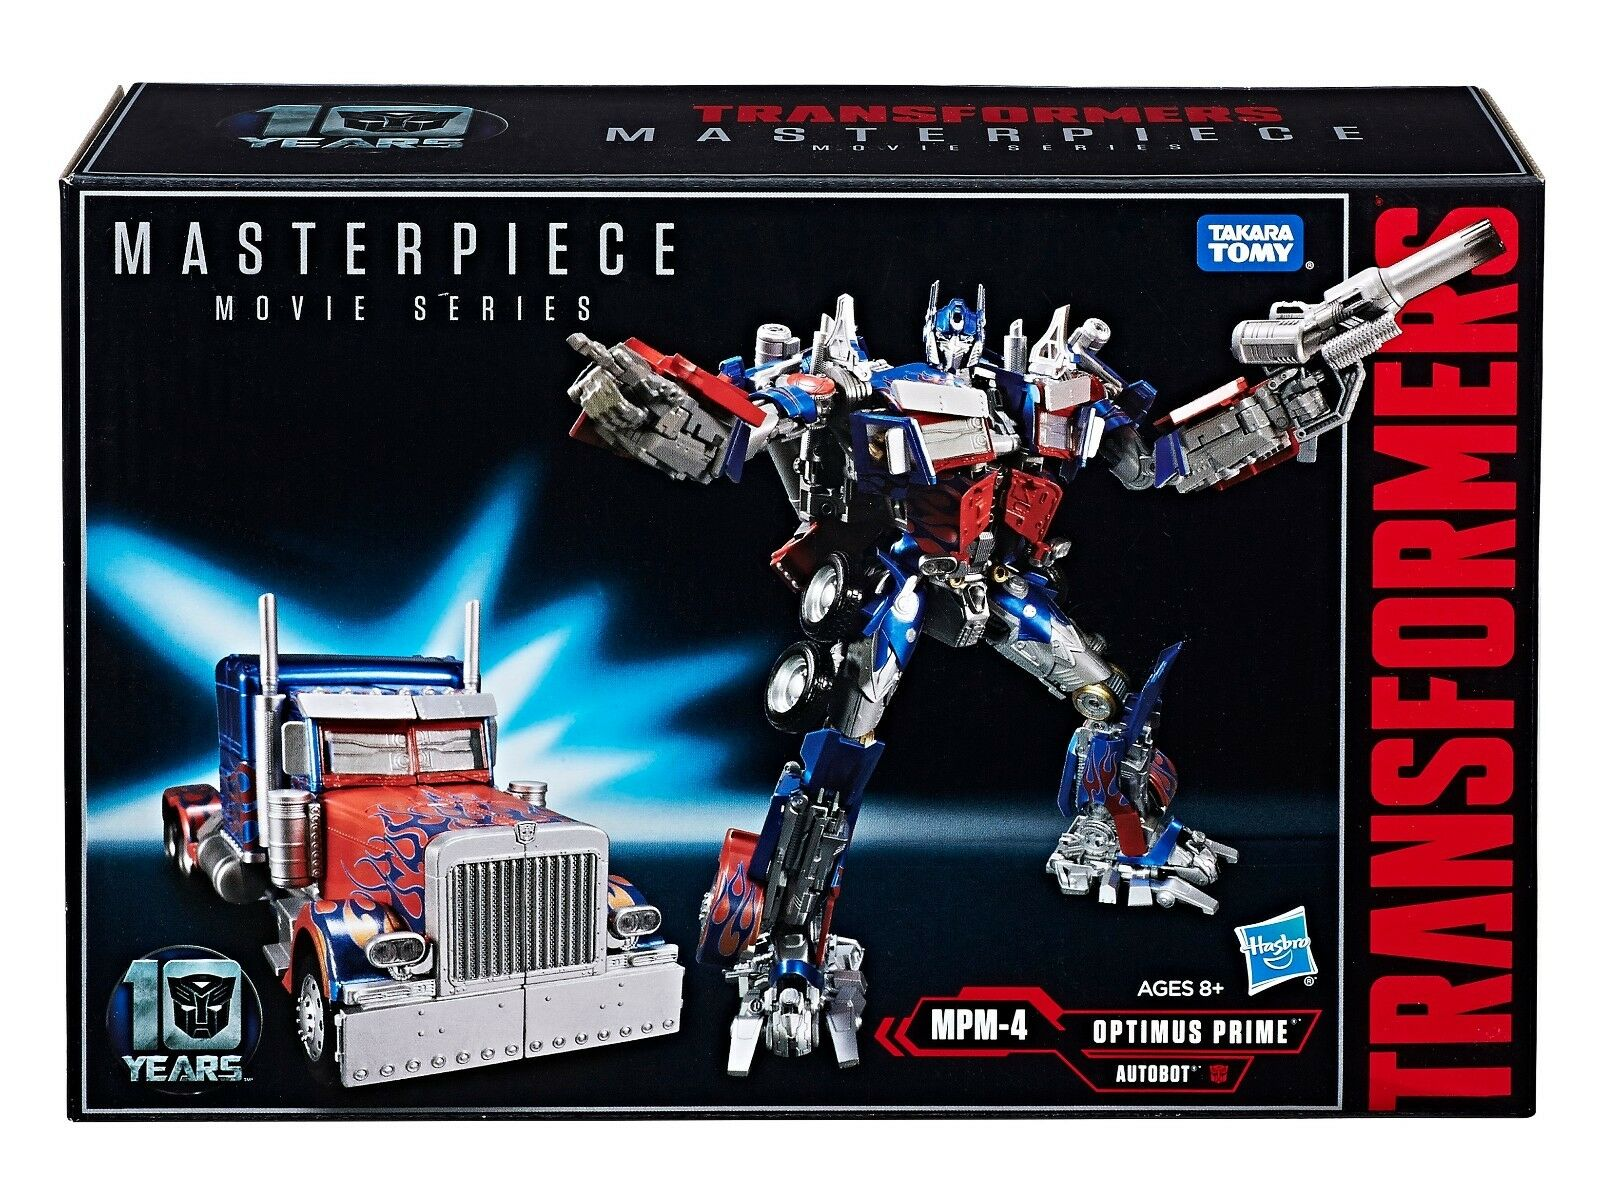 takara tomy transformers masterpiece mpm-04 optimus prime mpm-4